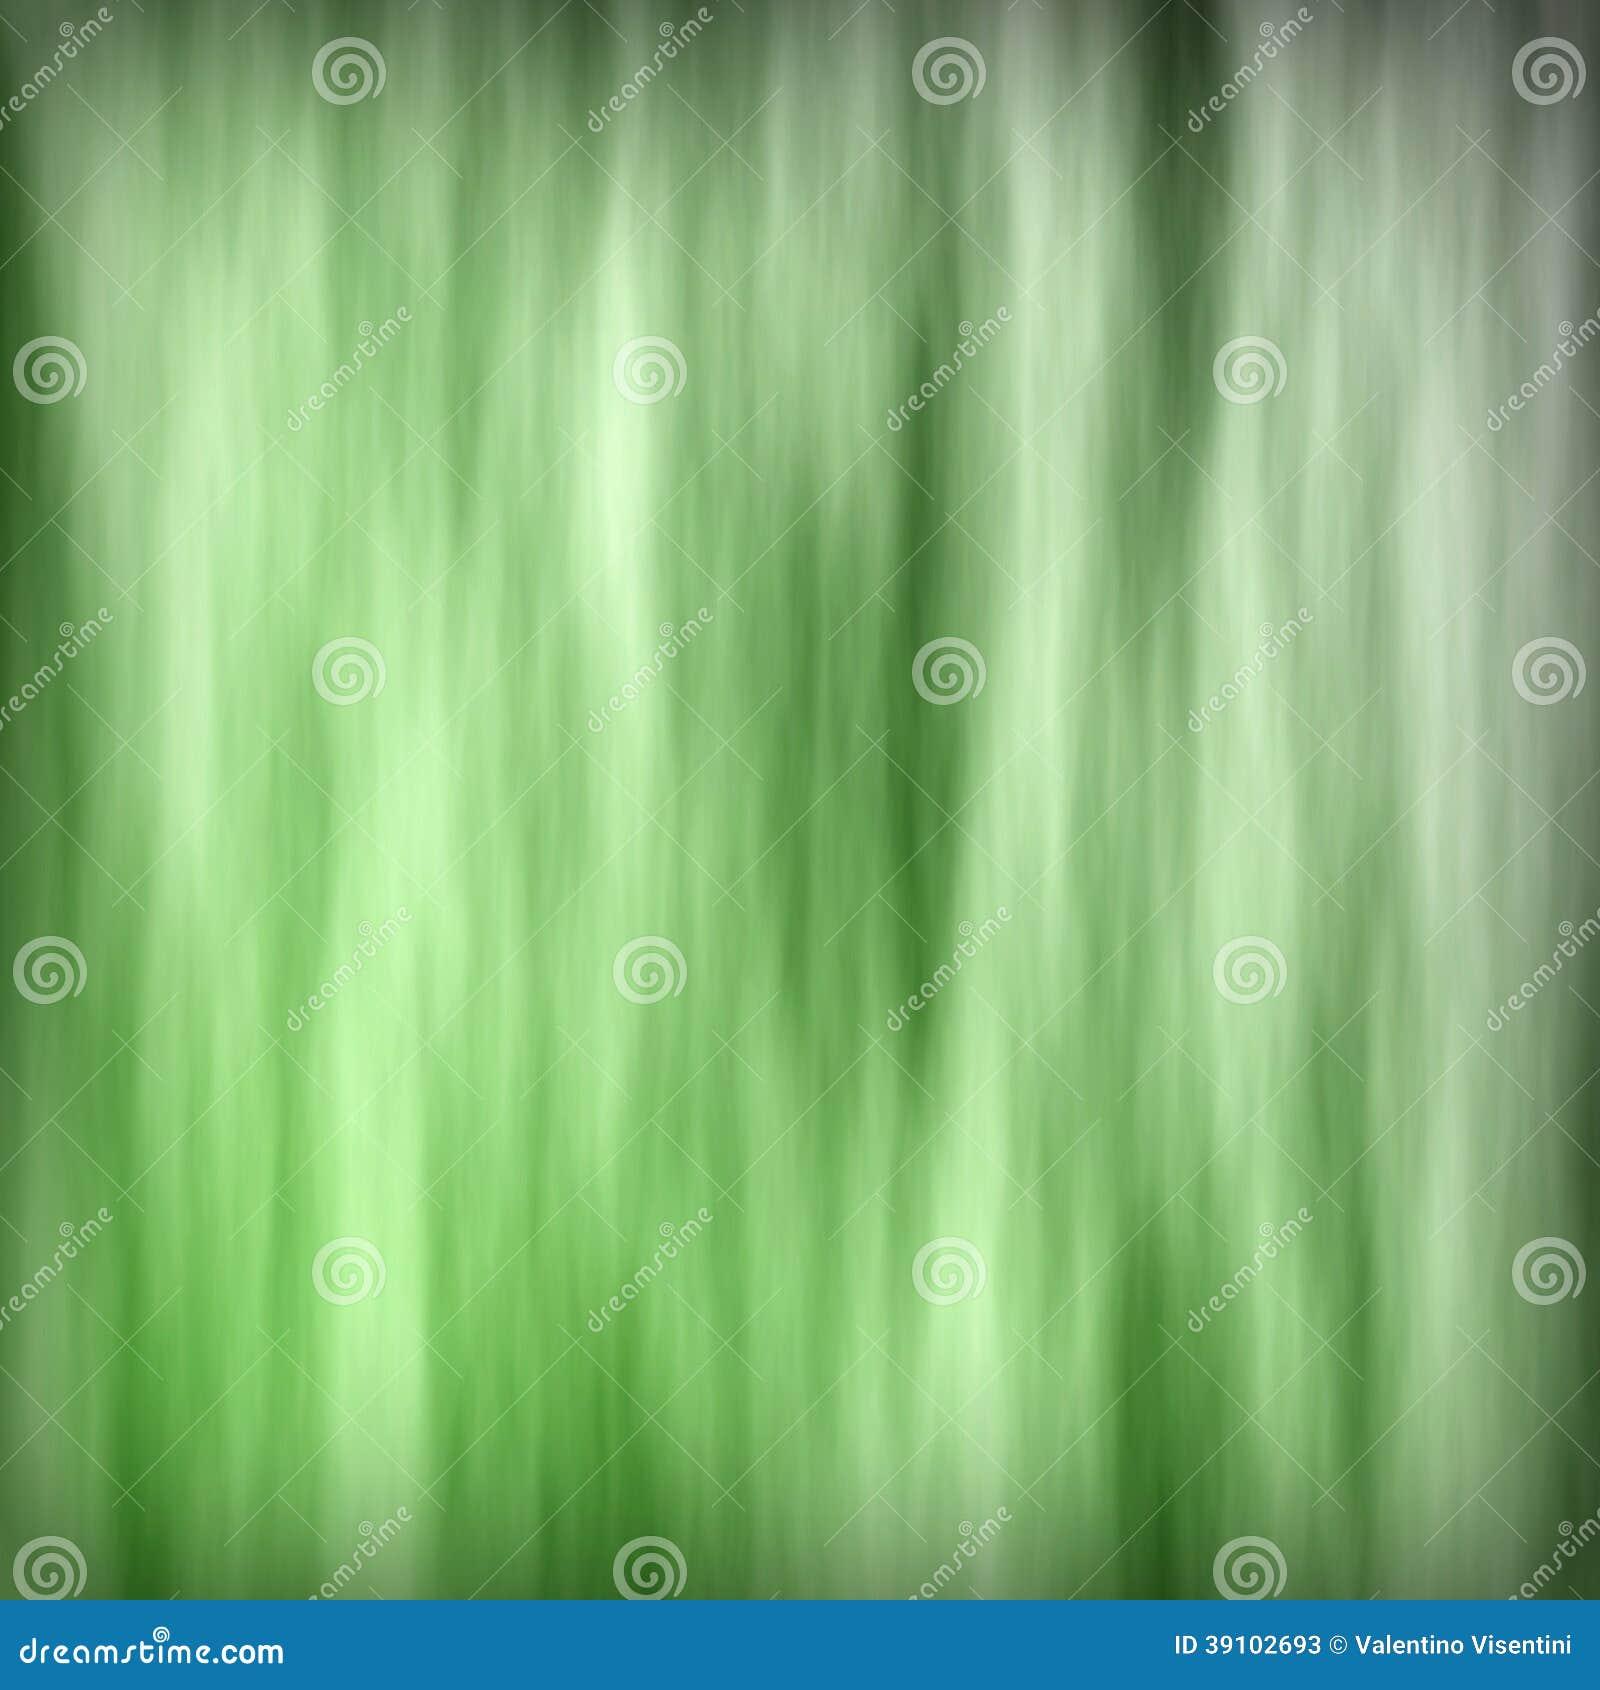 Abstracte groene textuurachtergrond